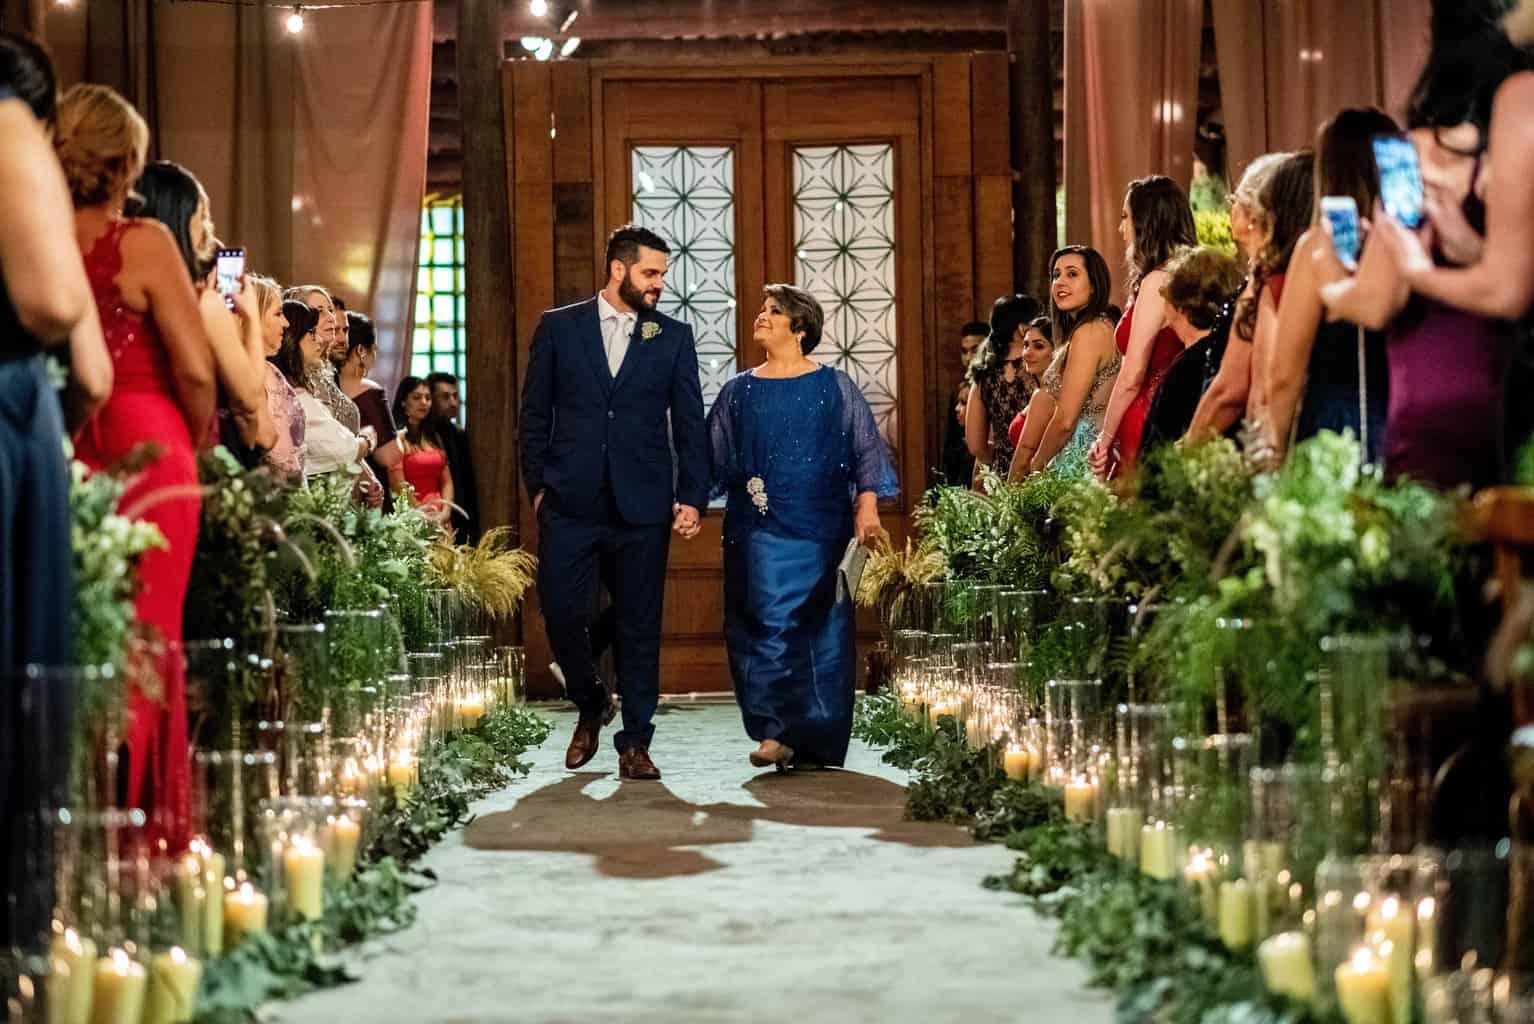 Bel-Benkler-eventos-Casamento-Ariane-e-Matheus-cerimonia-decoracao-contemporanea-fotografia-Rafael-Bigarelli-noivos-na-pista-Spazio-Giardini-12